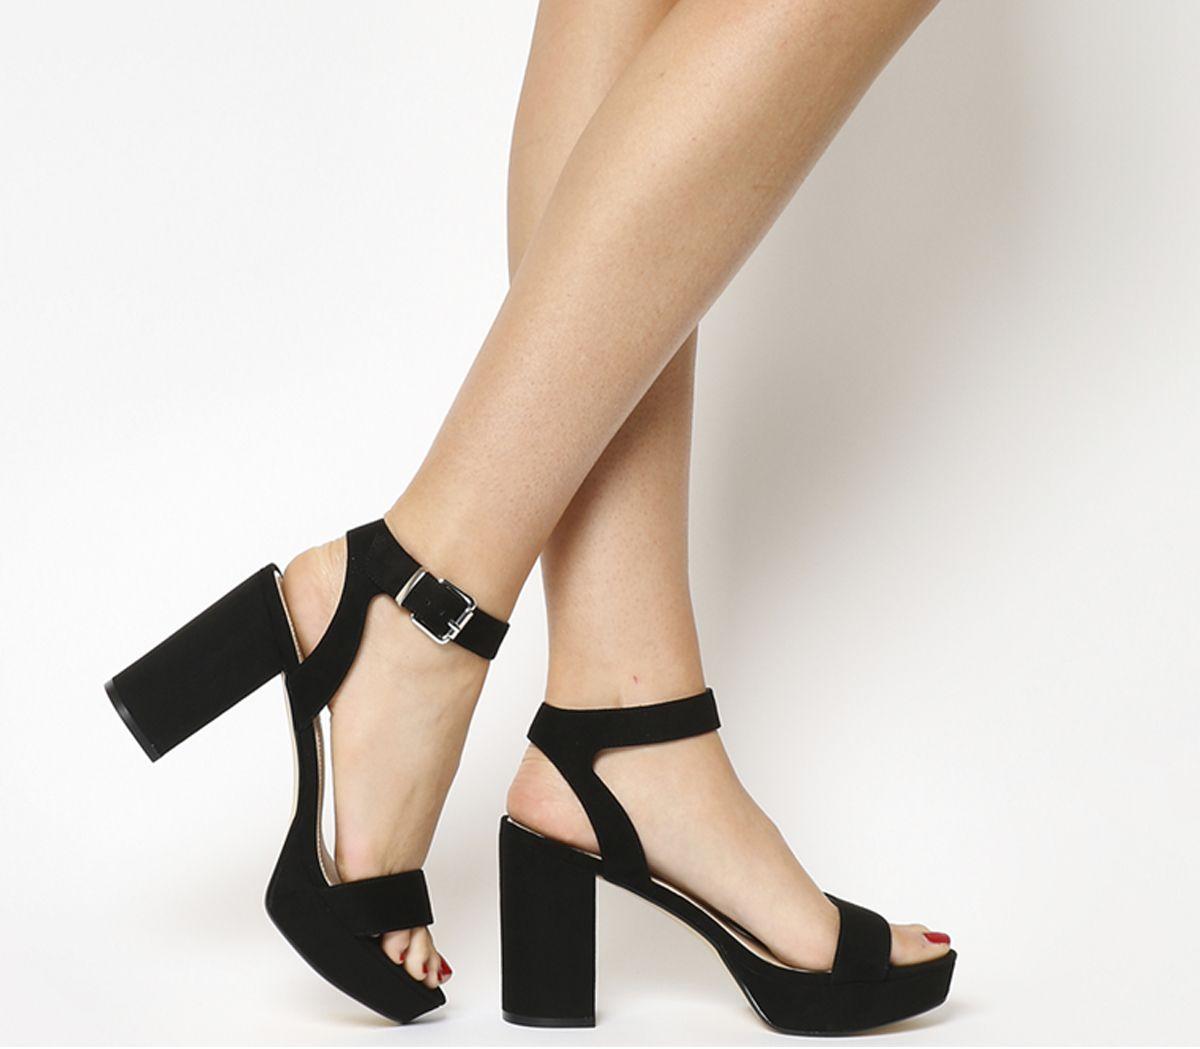 e239fd3bf9 Office Mossy Platform Sandals Black - Mid Heels